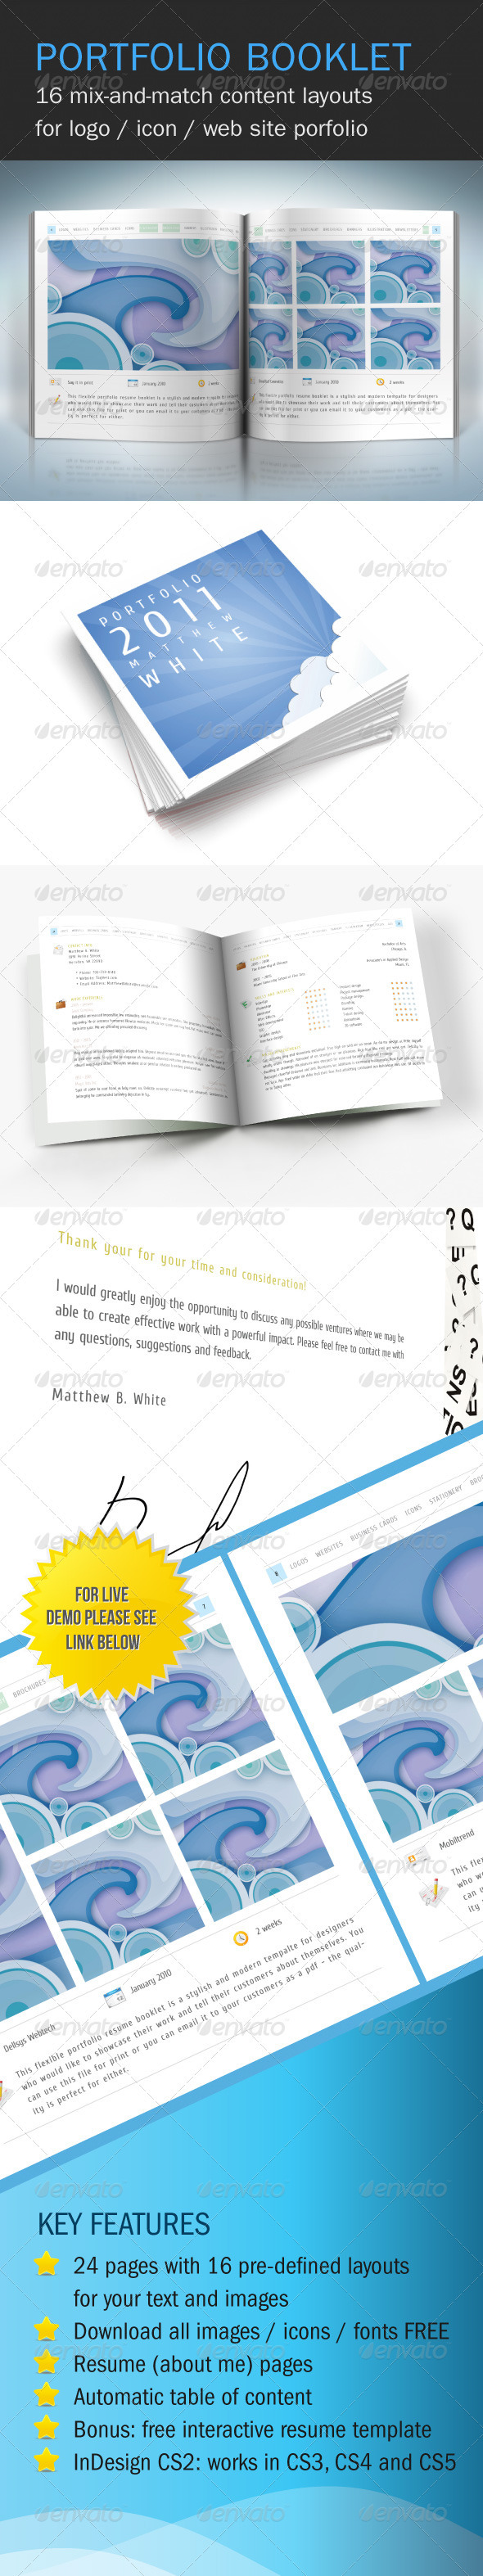 GraphicRiver Flexible Portfolio Booklet with Resume 212630